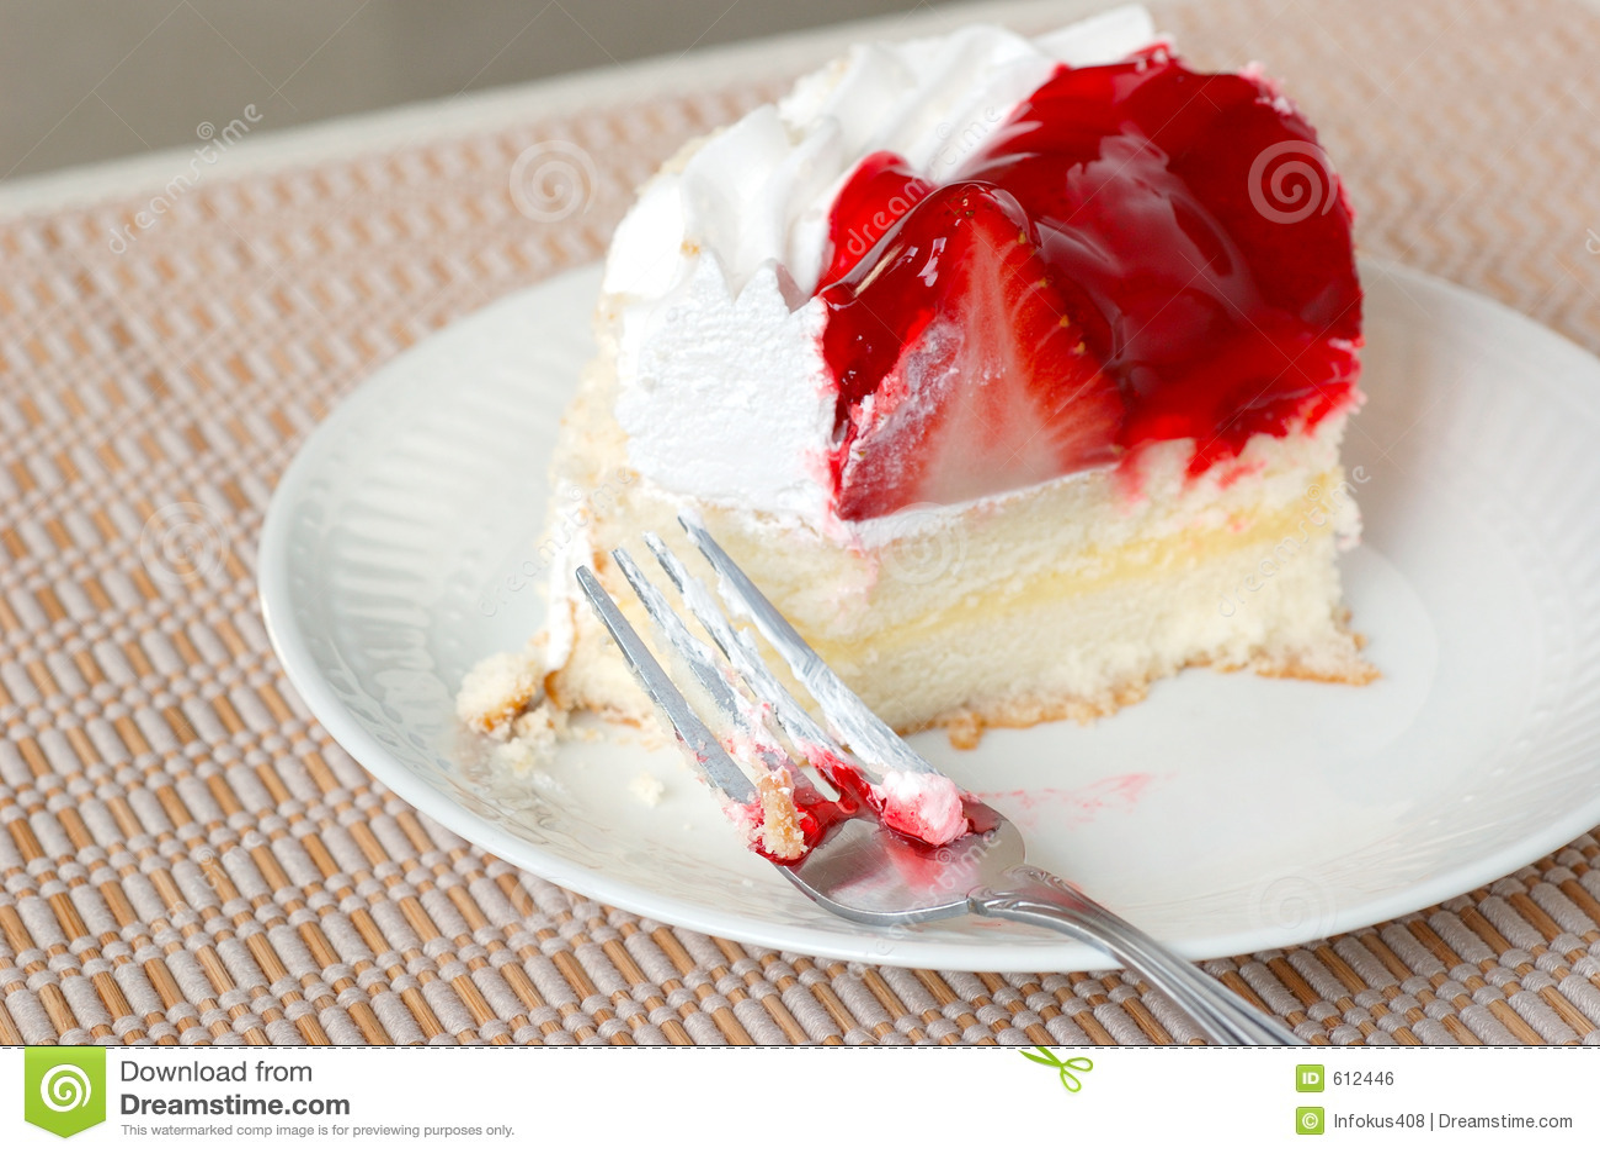 Eet cake